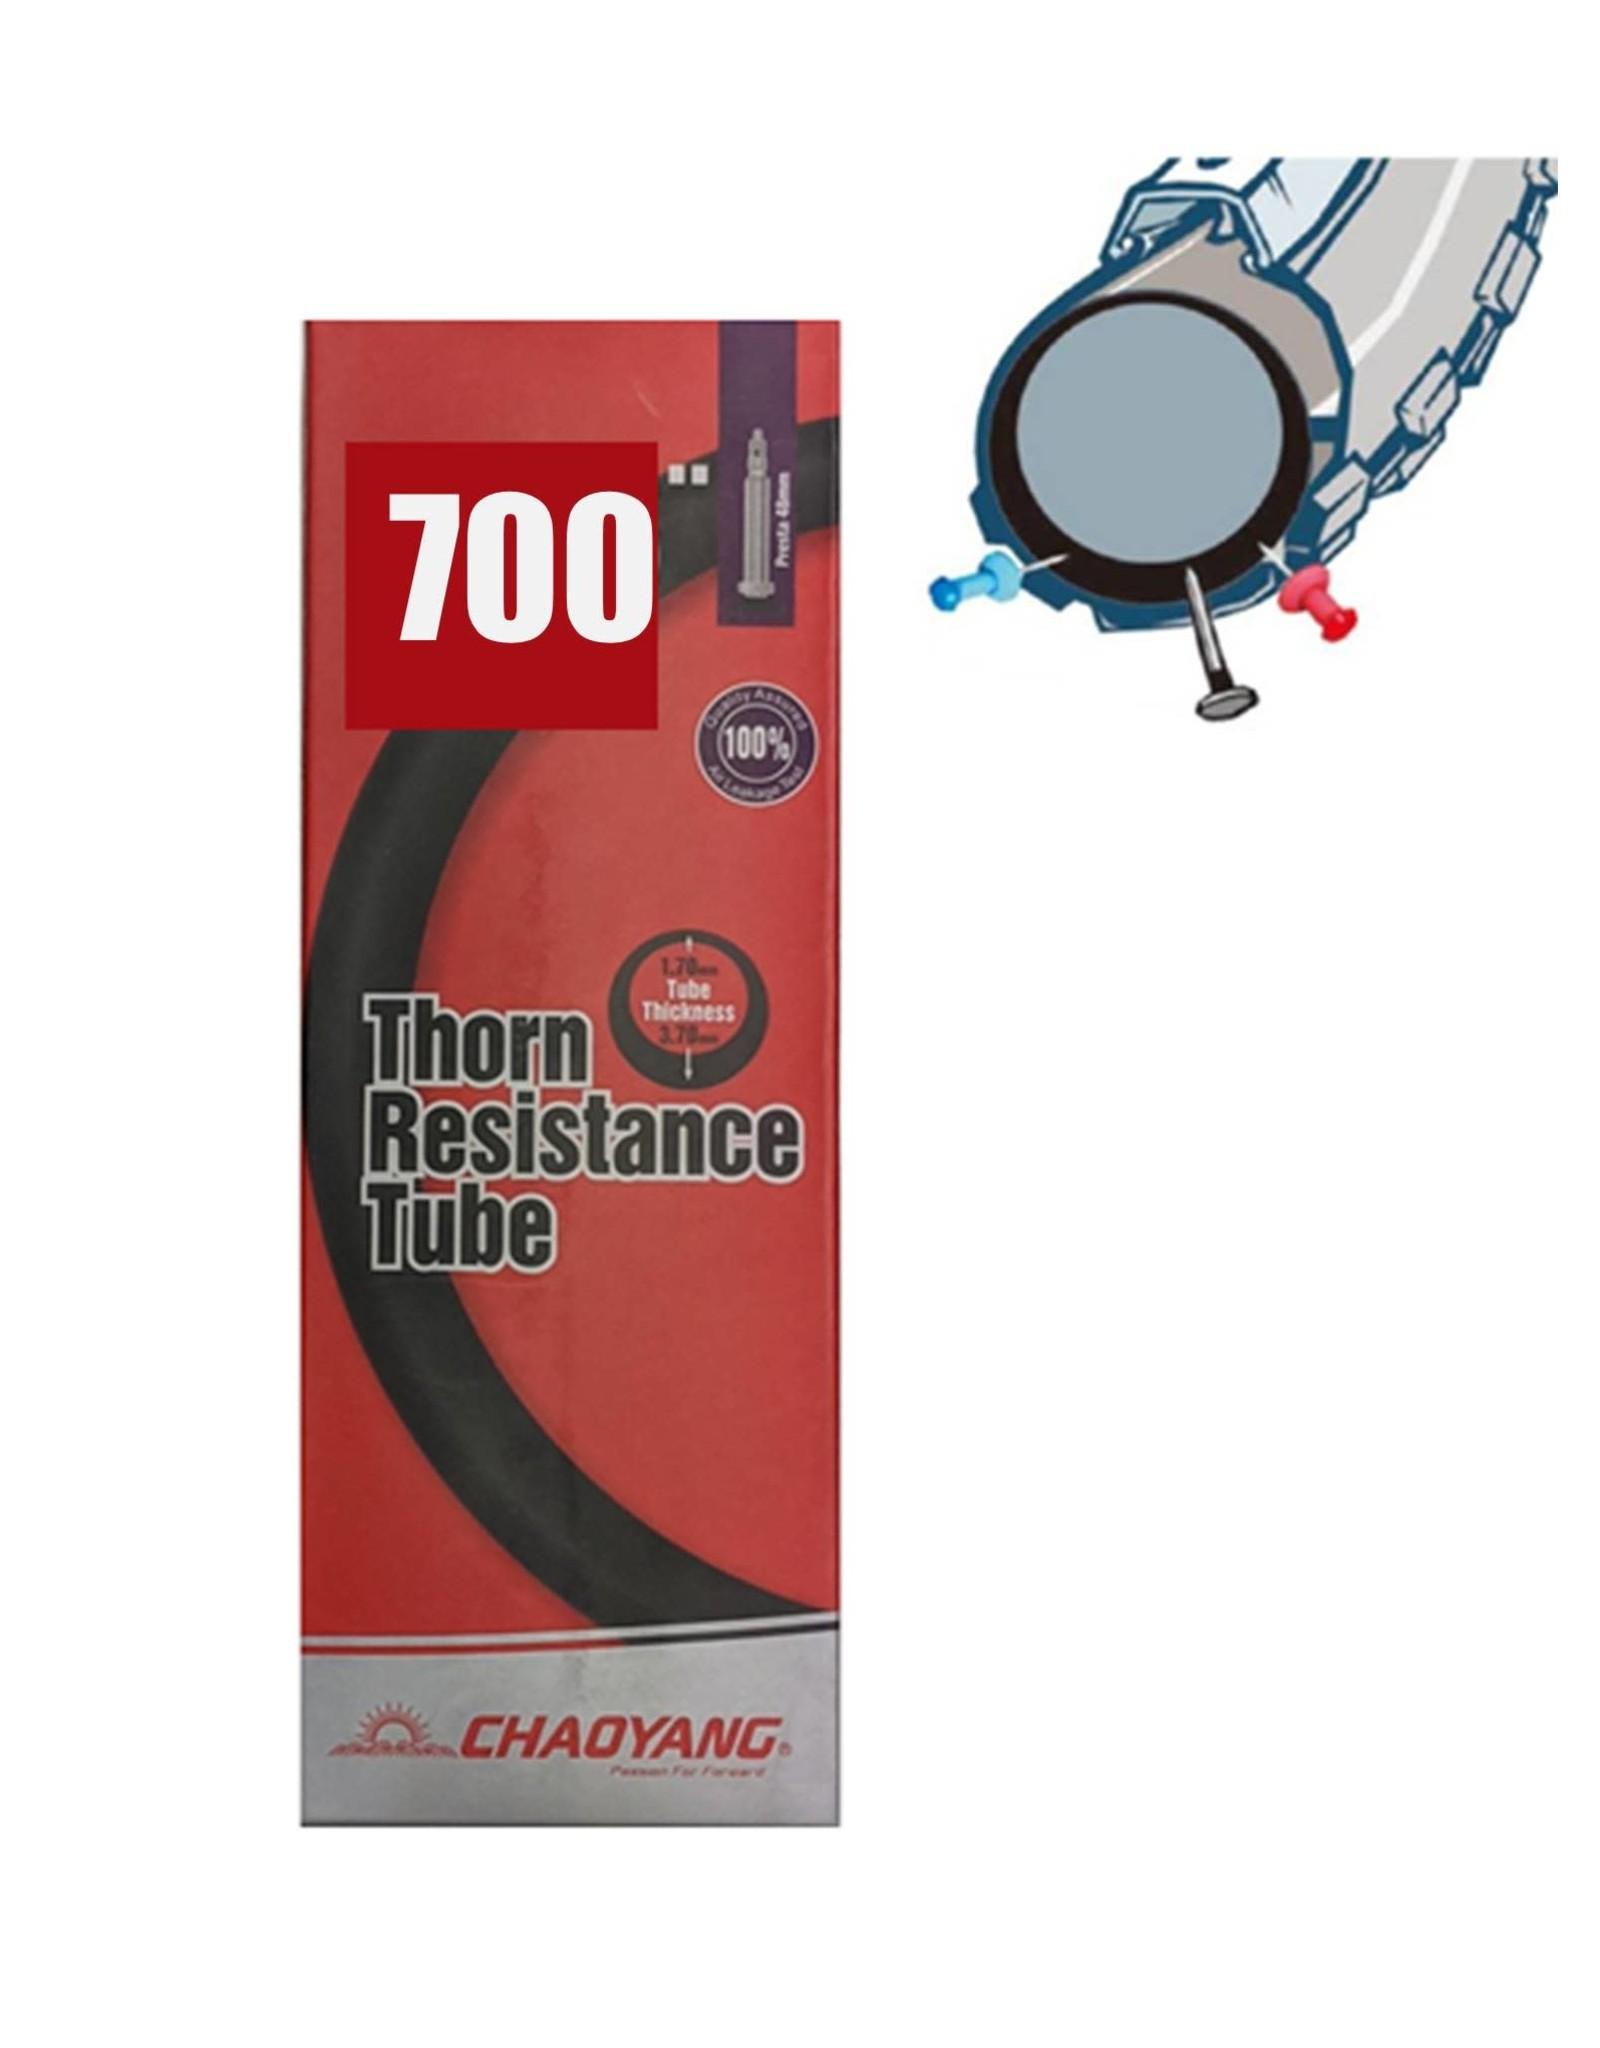 Chaoyang 700 x 25/32 Thorn Presta Tube